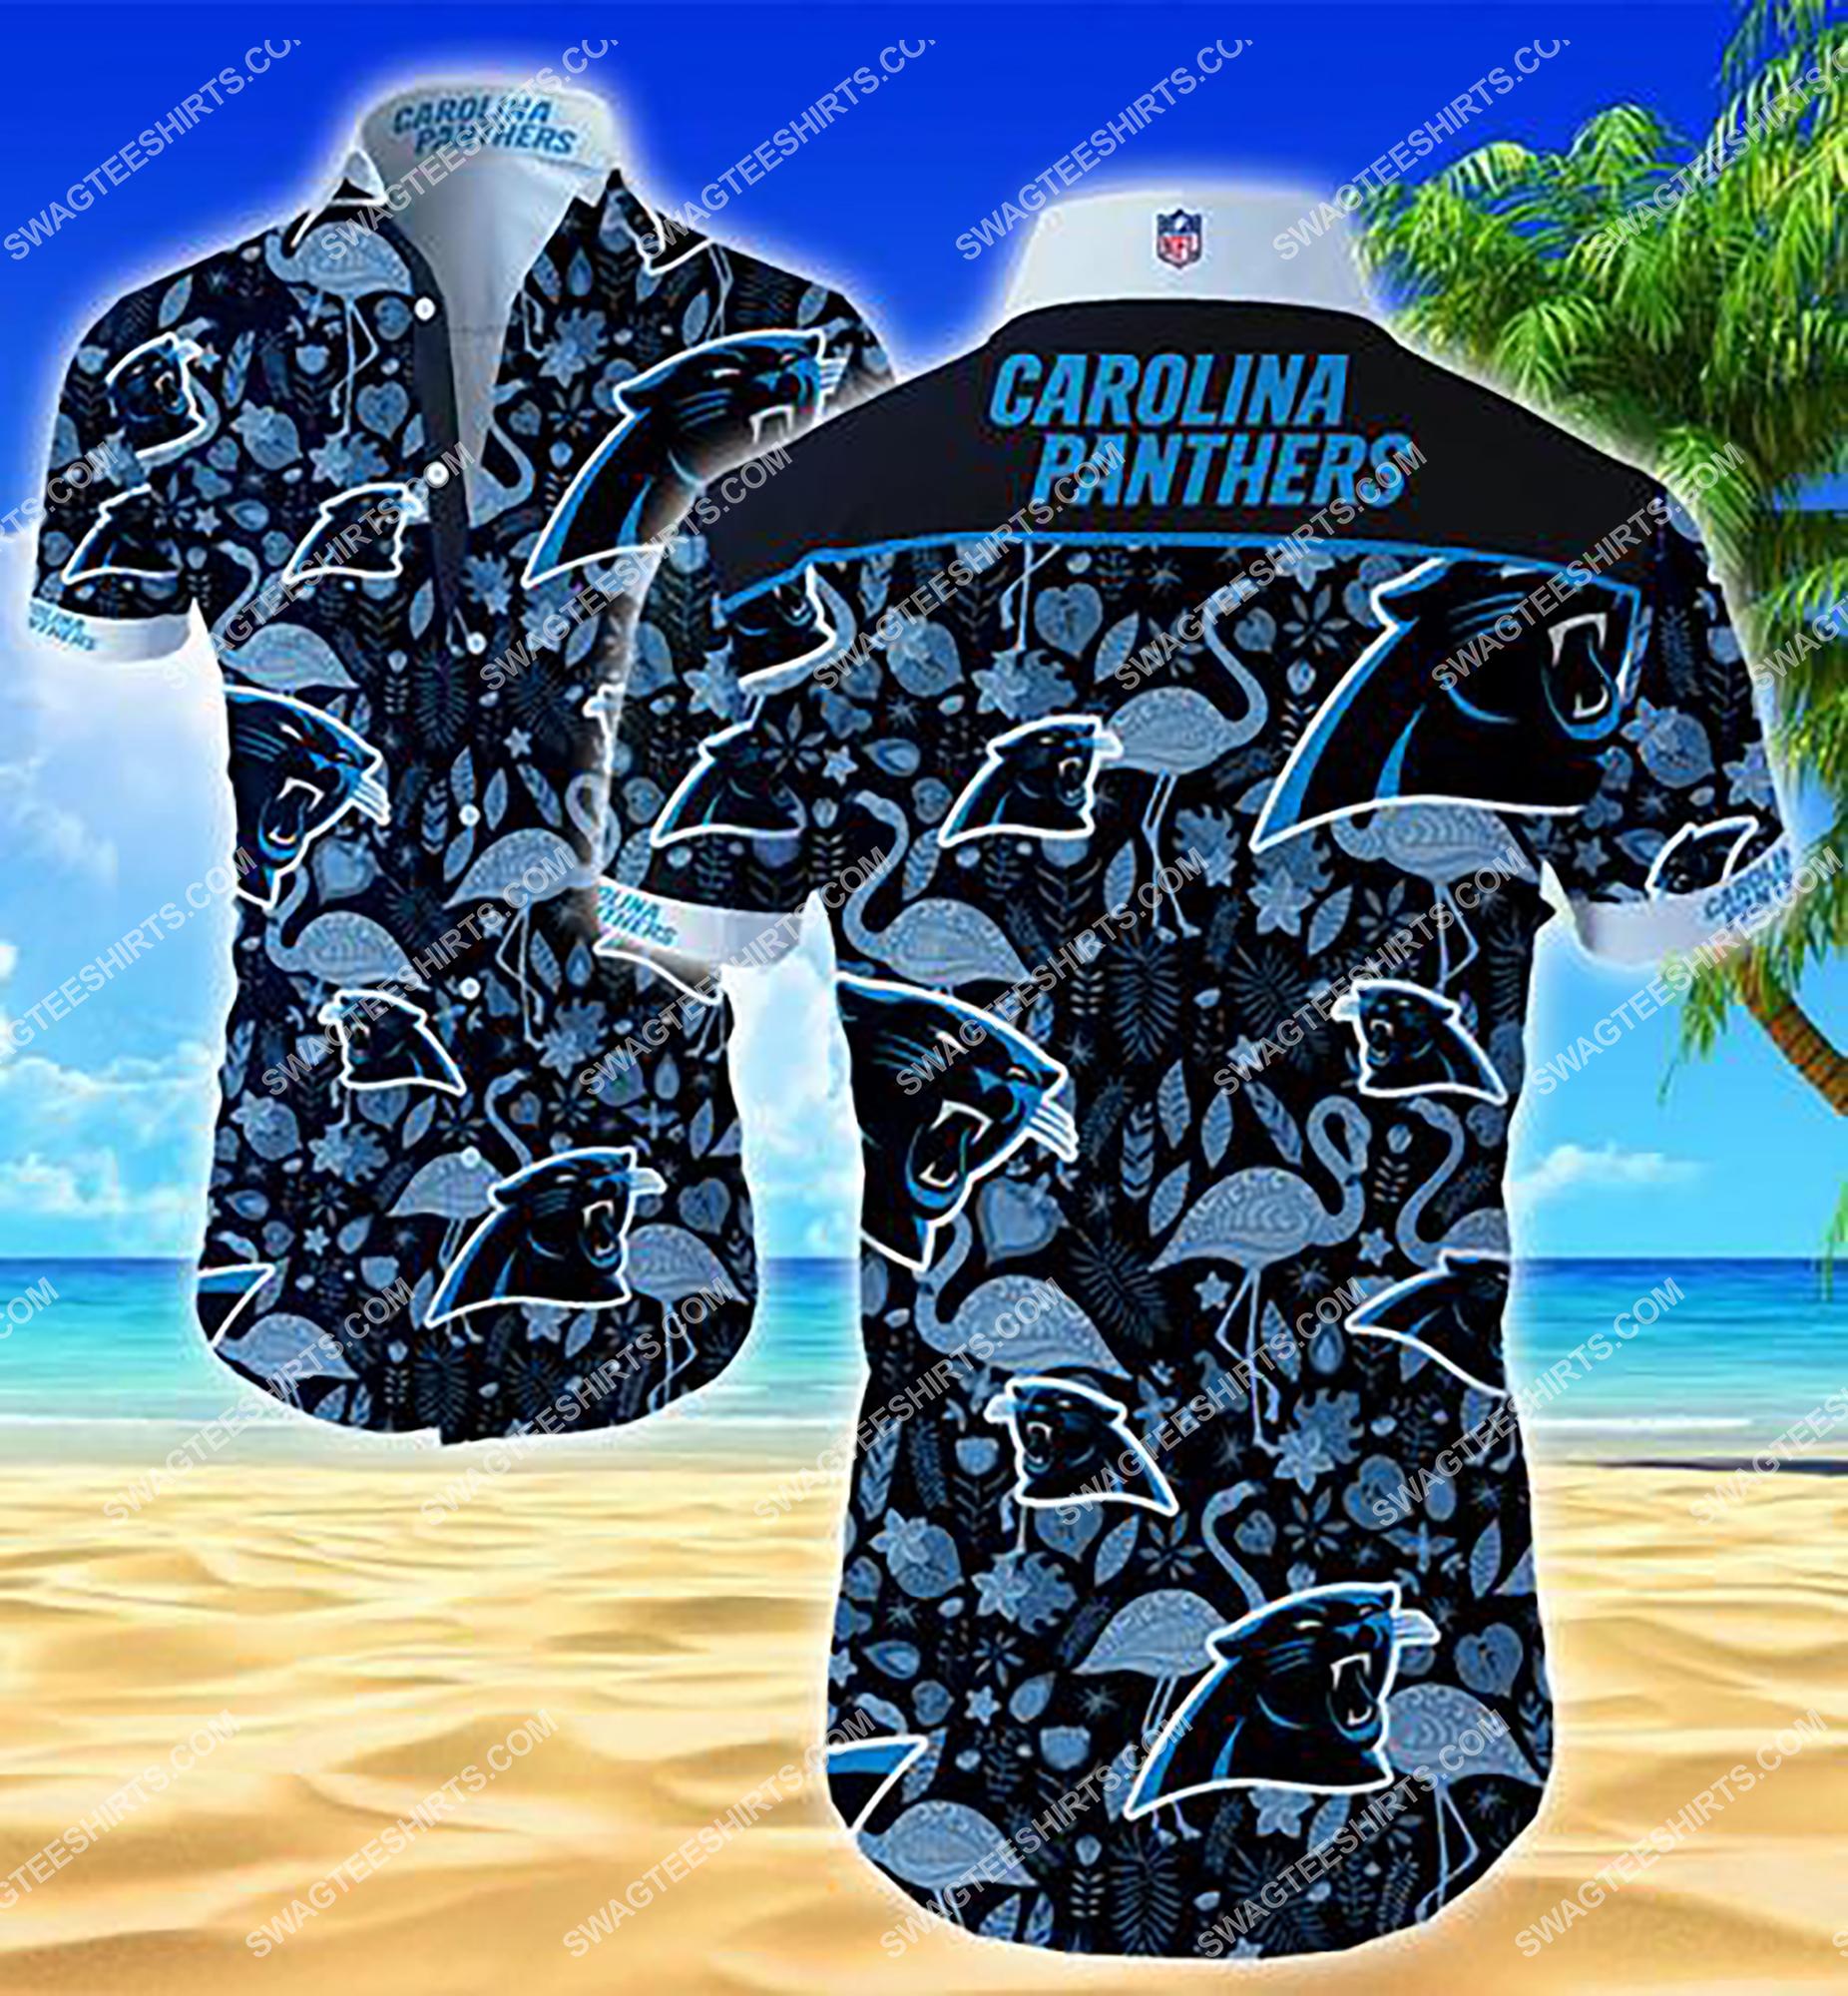 the carolina panthers football team summer hawaiian shirt 2